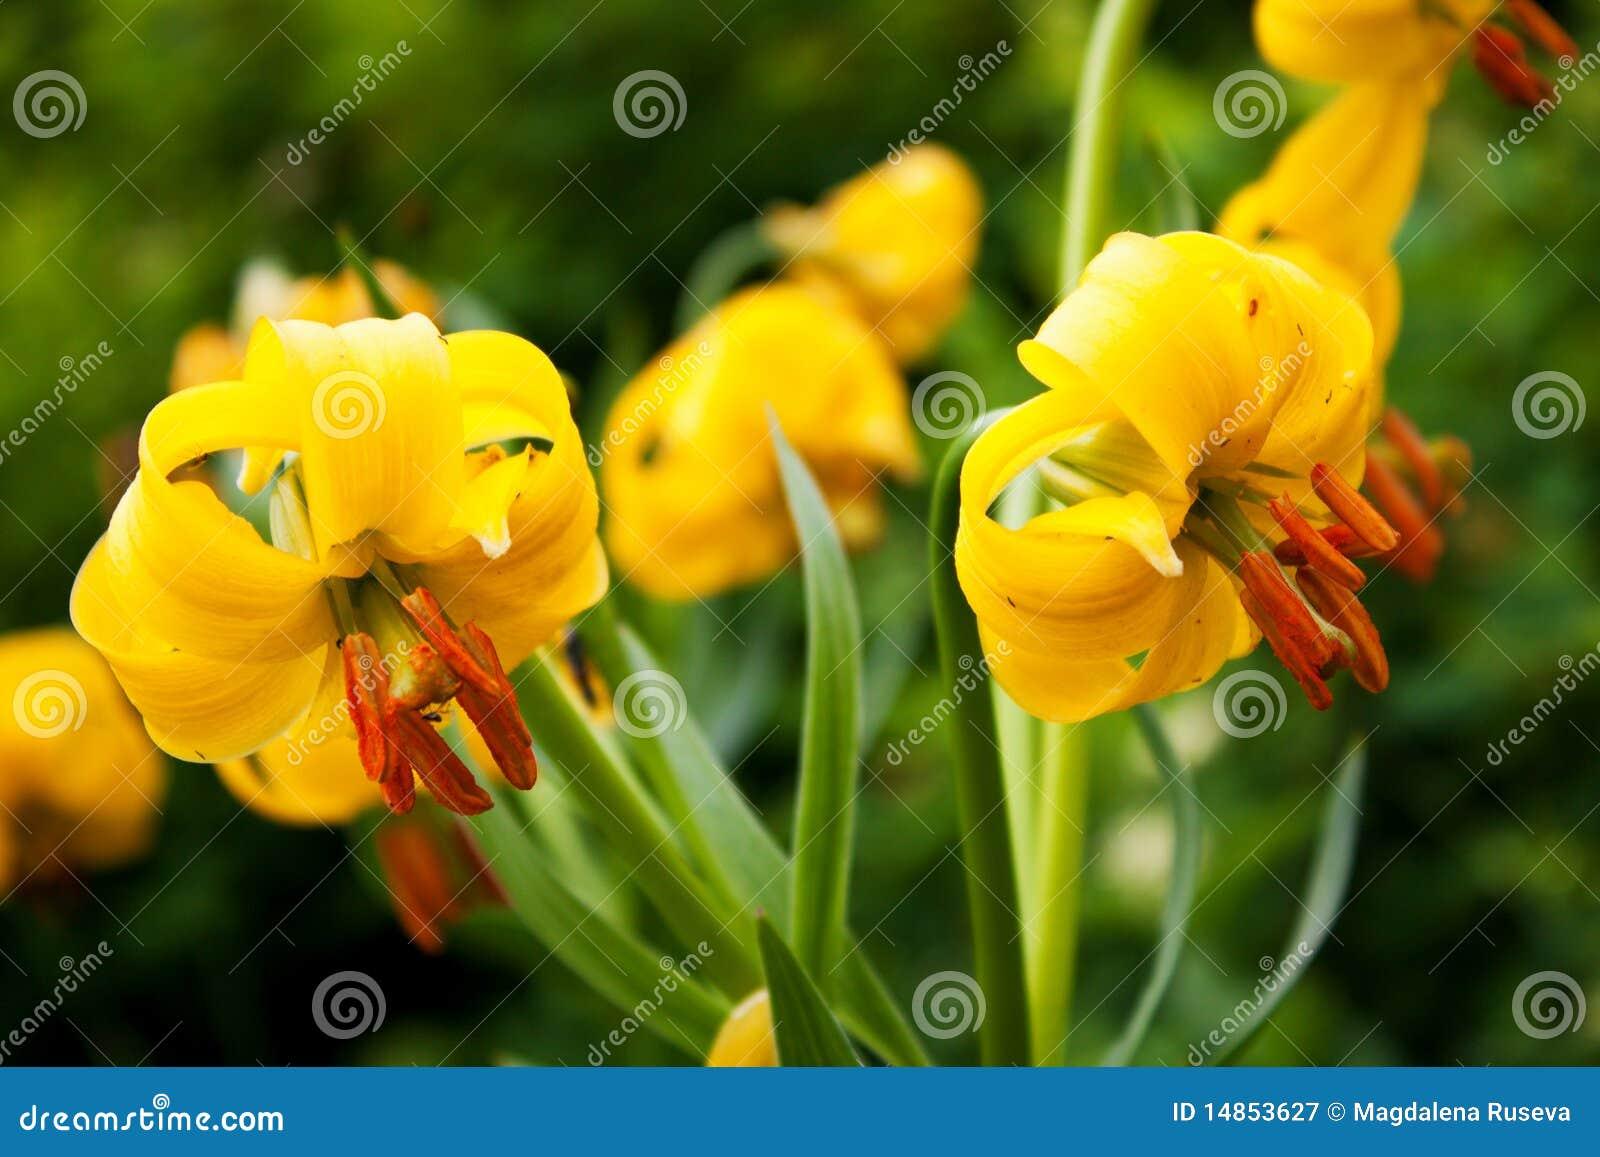 Lily flowers - Lilium jankae